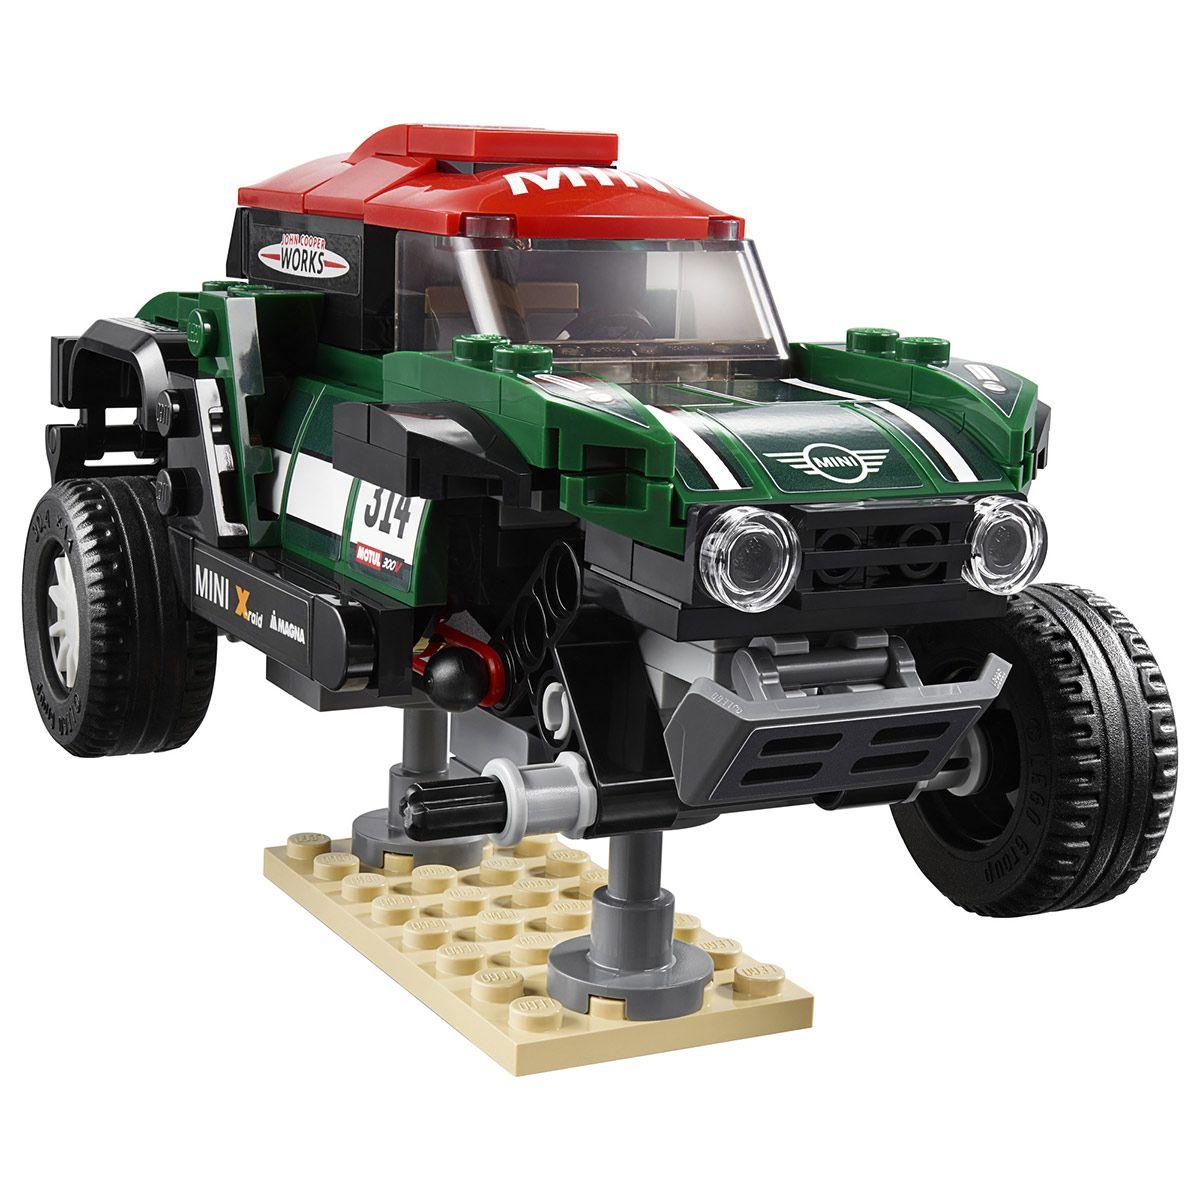 1967 Buggy John Rally Works Et Mini 2018 Cooper 75894 S LpqMGSUzV